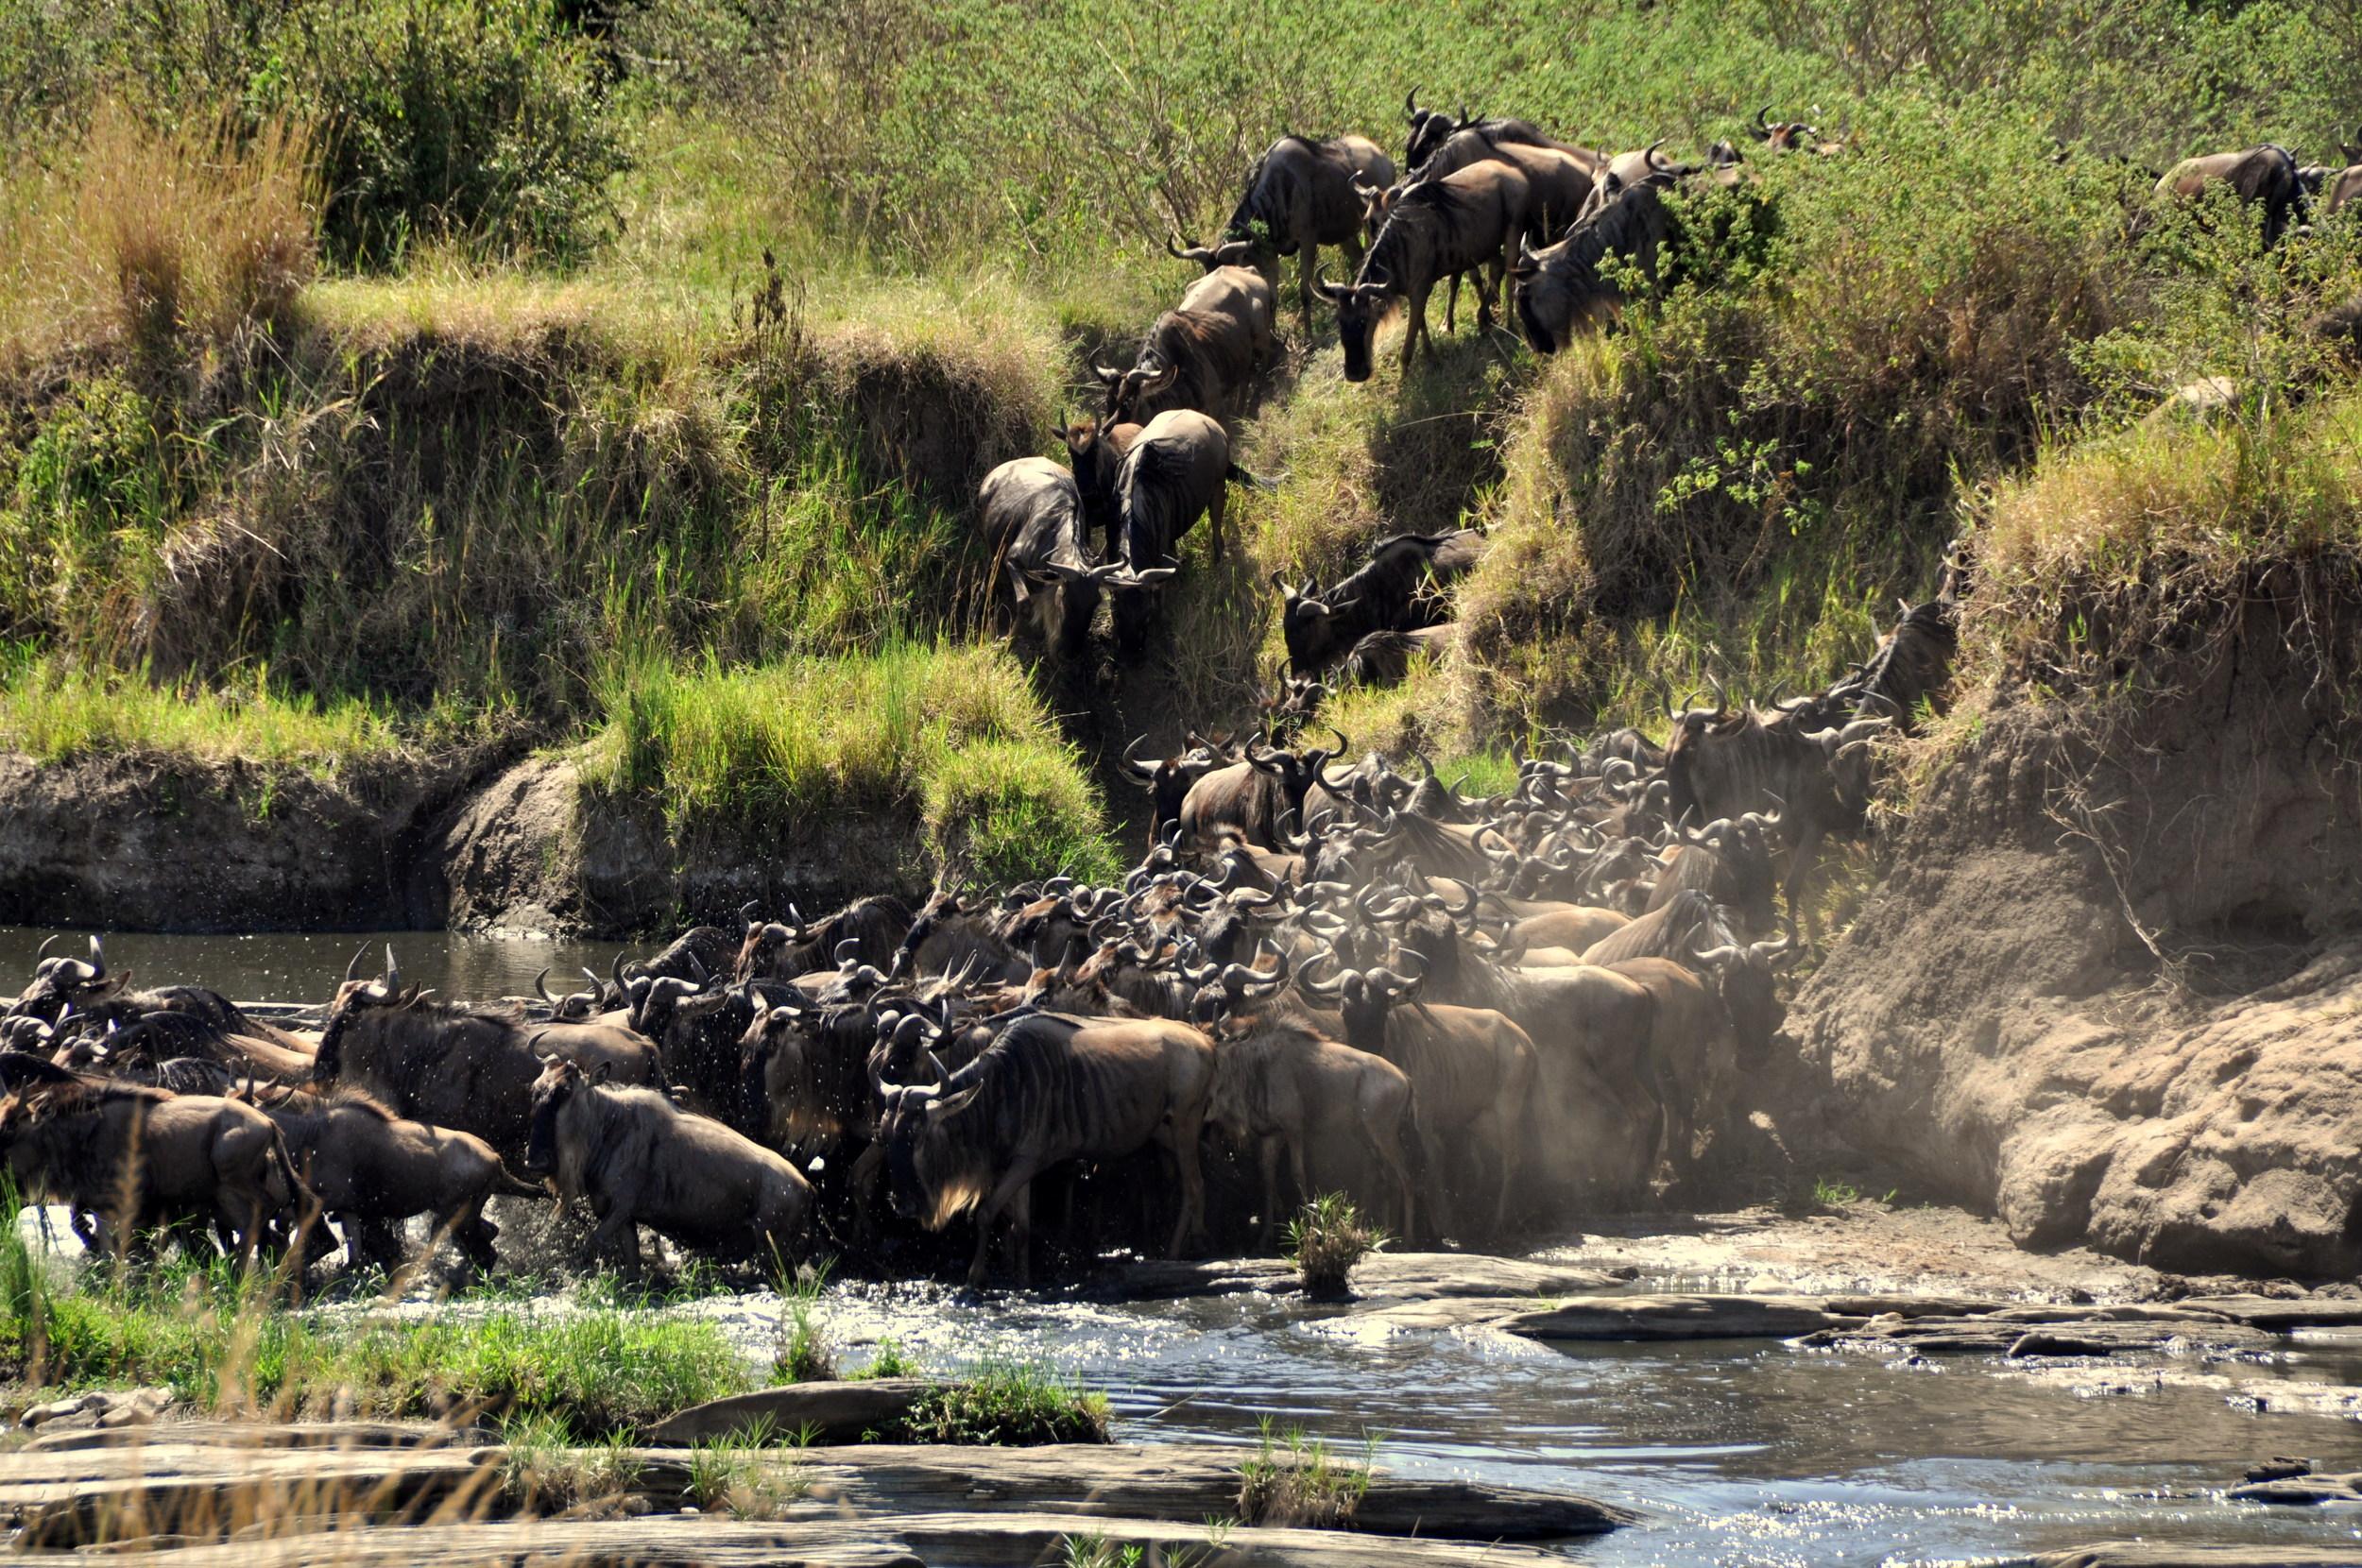 Wildebeest Migration from Serengeti, Tanzania to Maasai Mara, Kenya, Africa